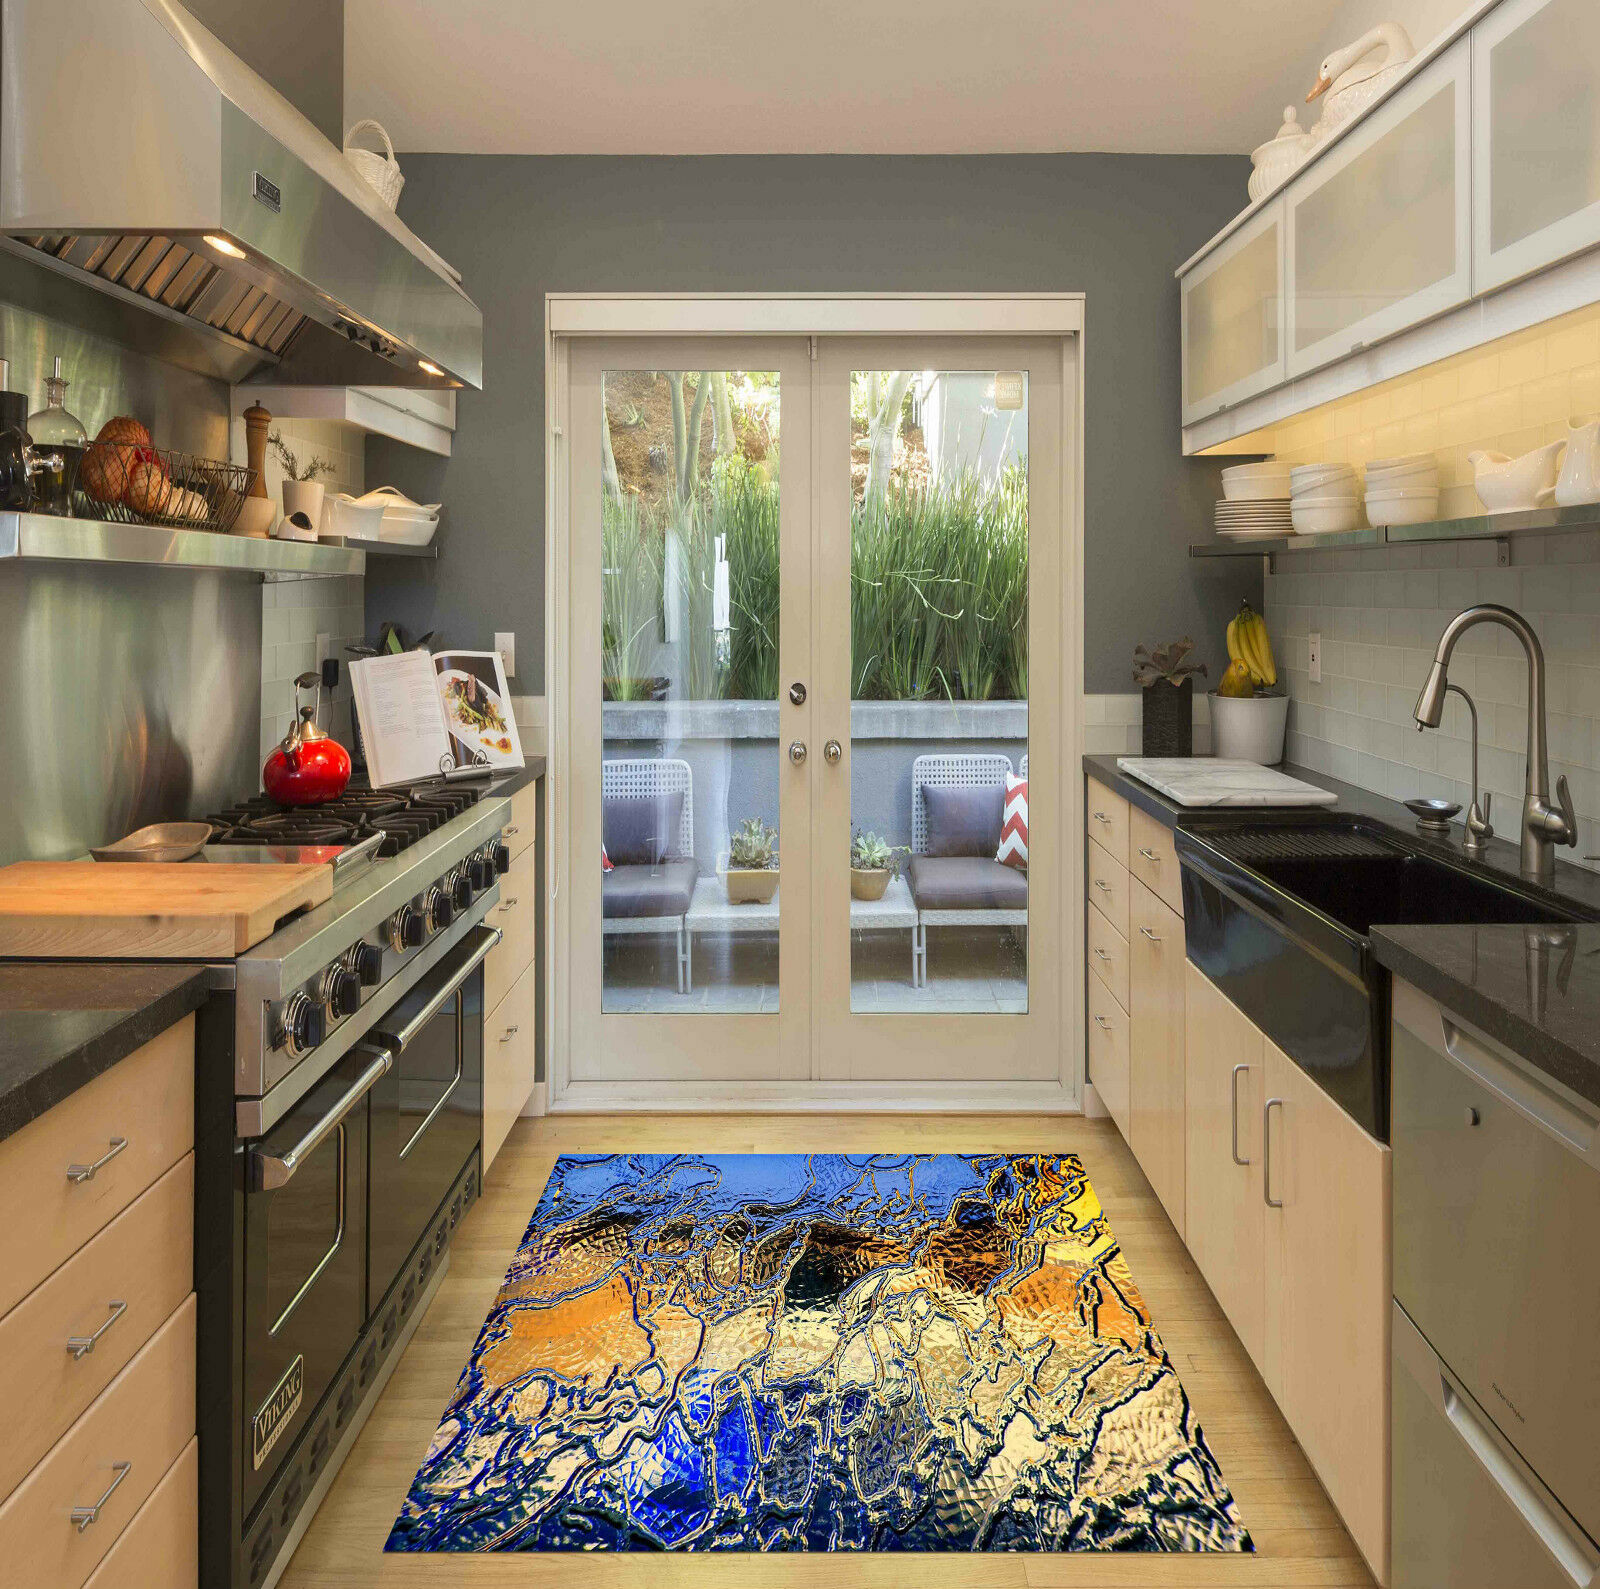 3D Brillant En Verre Motif Décor Mural Murale De Mur De Cuisine AJ WALLPAPER FR